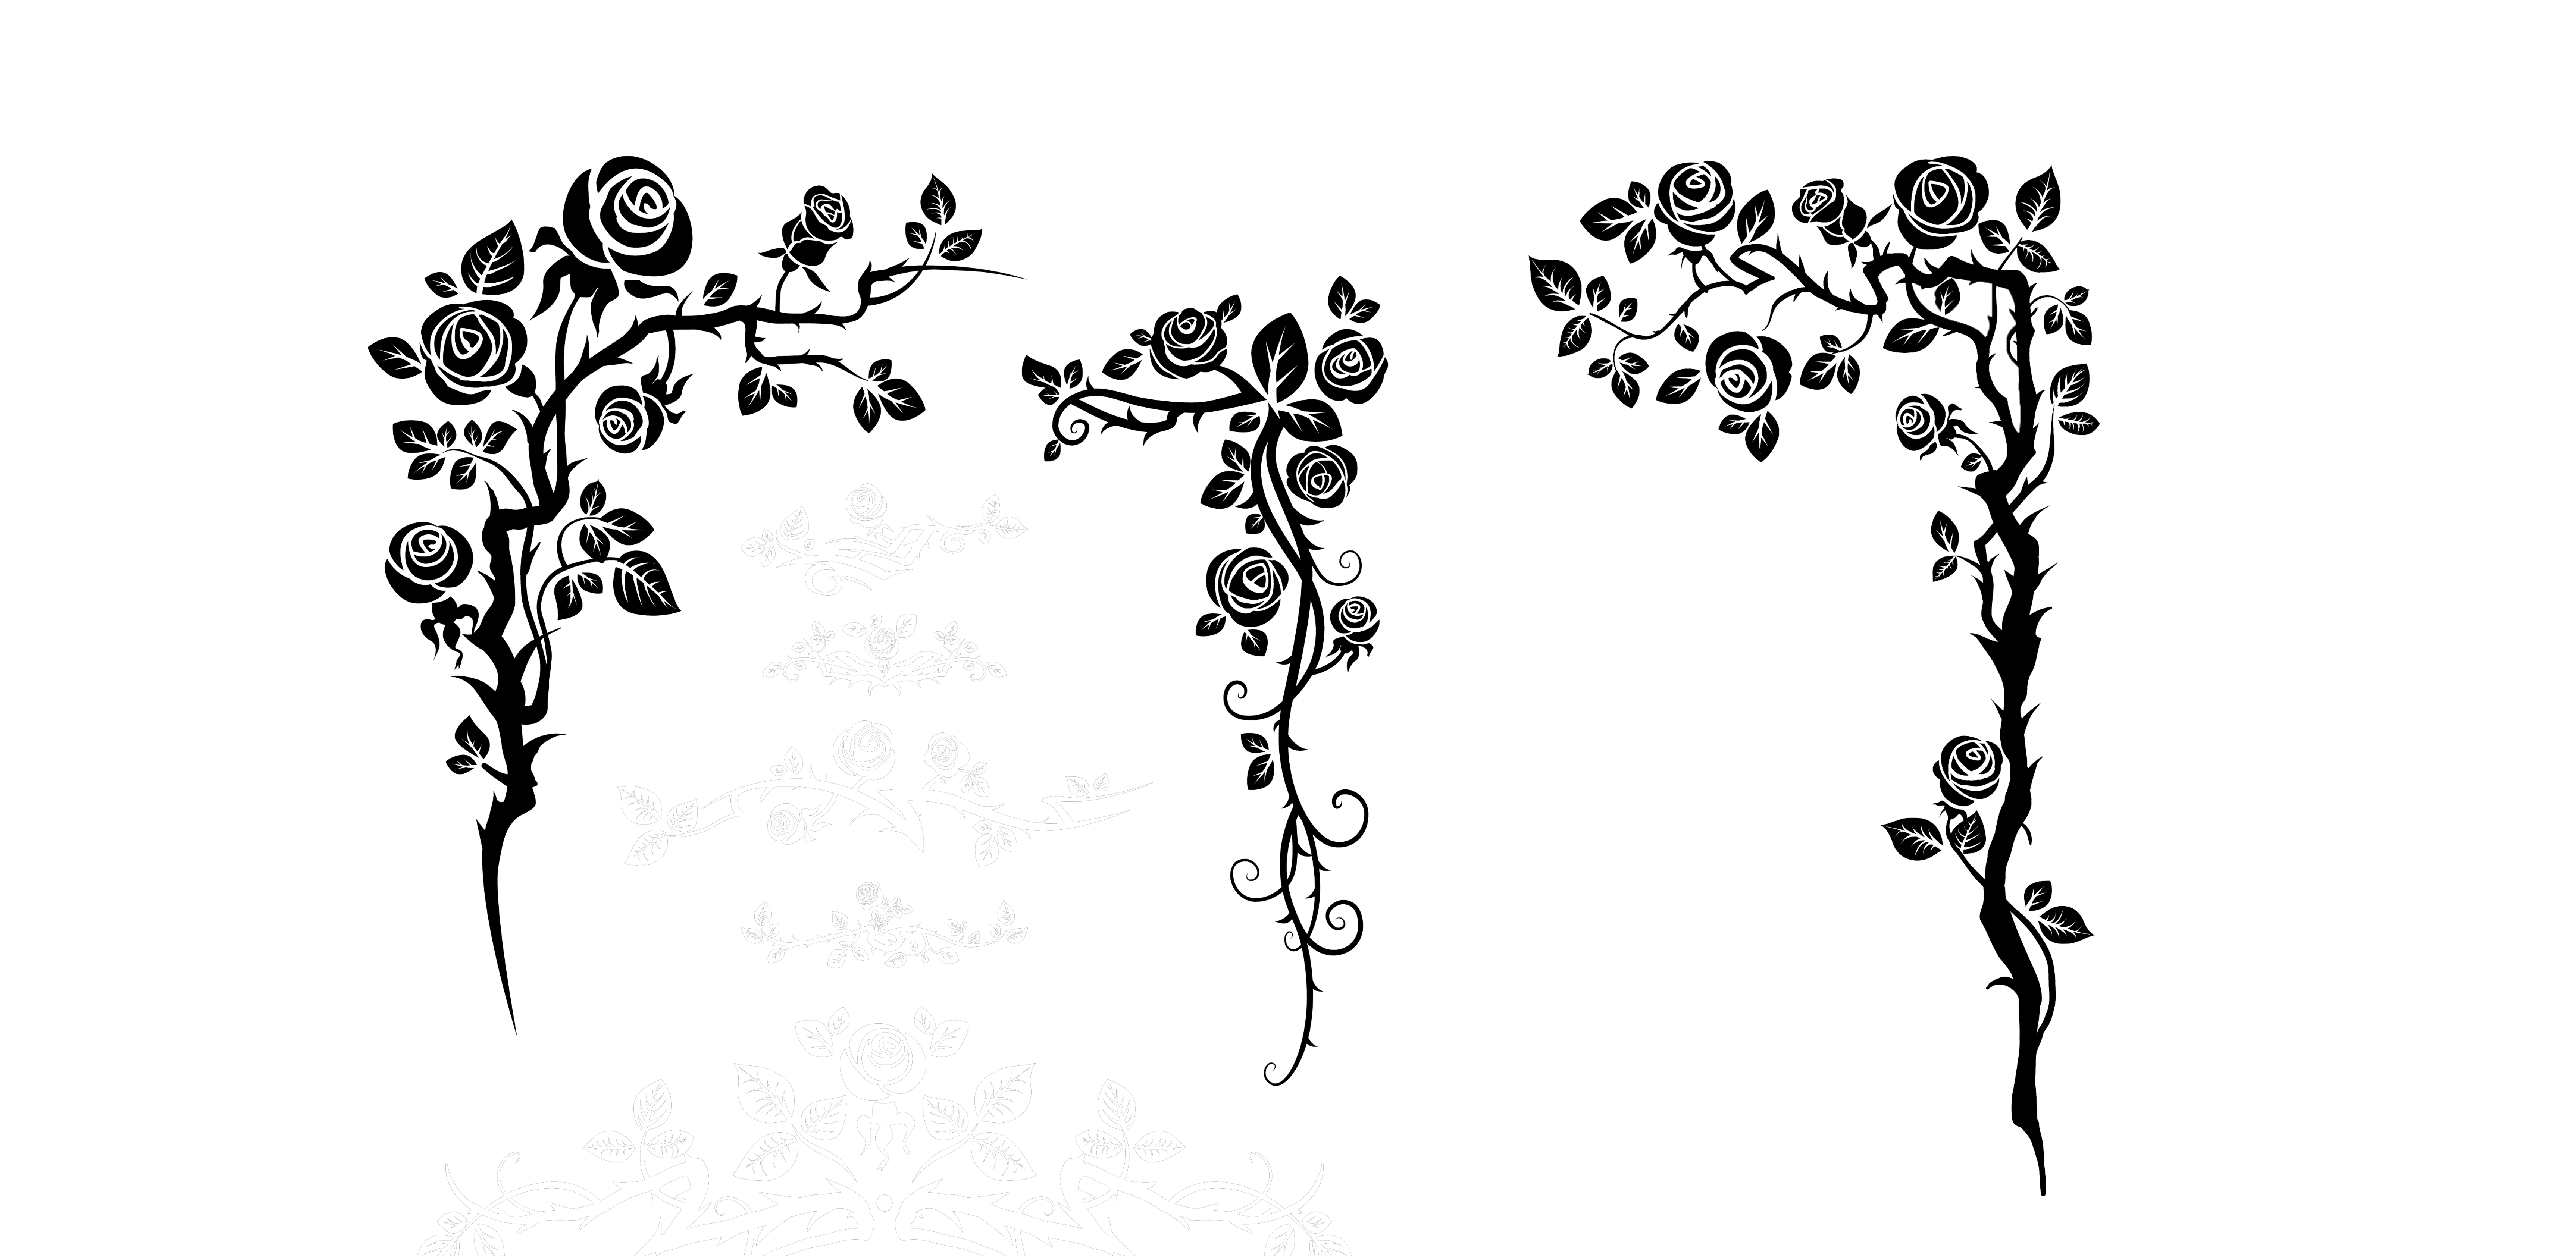 Lace clipart silhouette. Illustration flower vine png